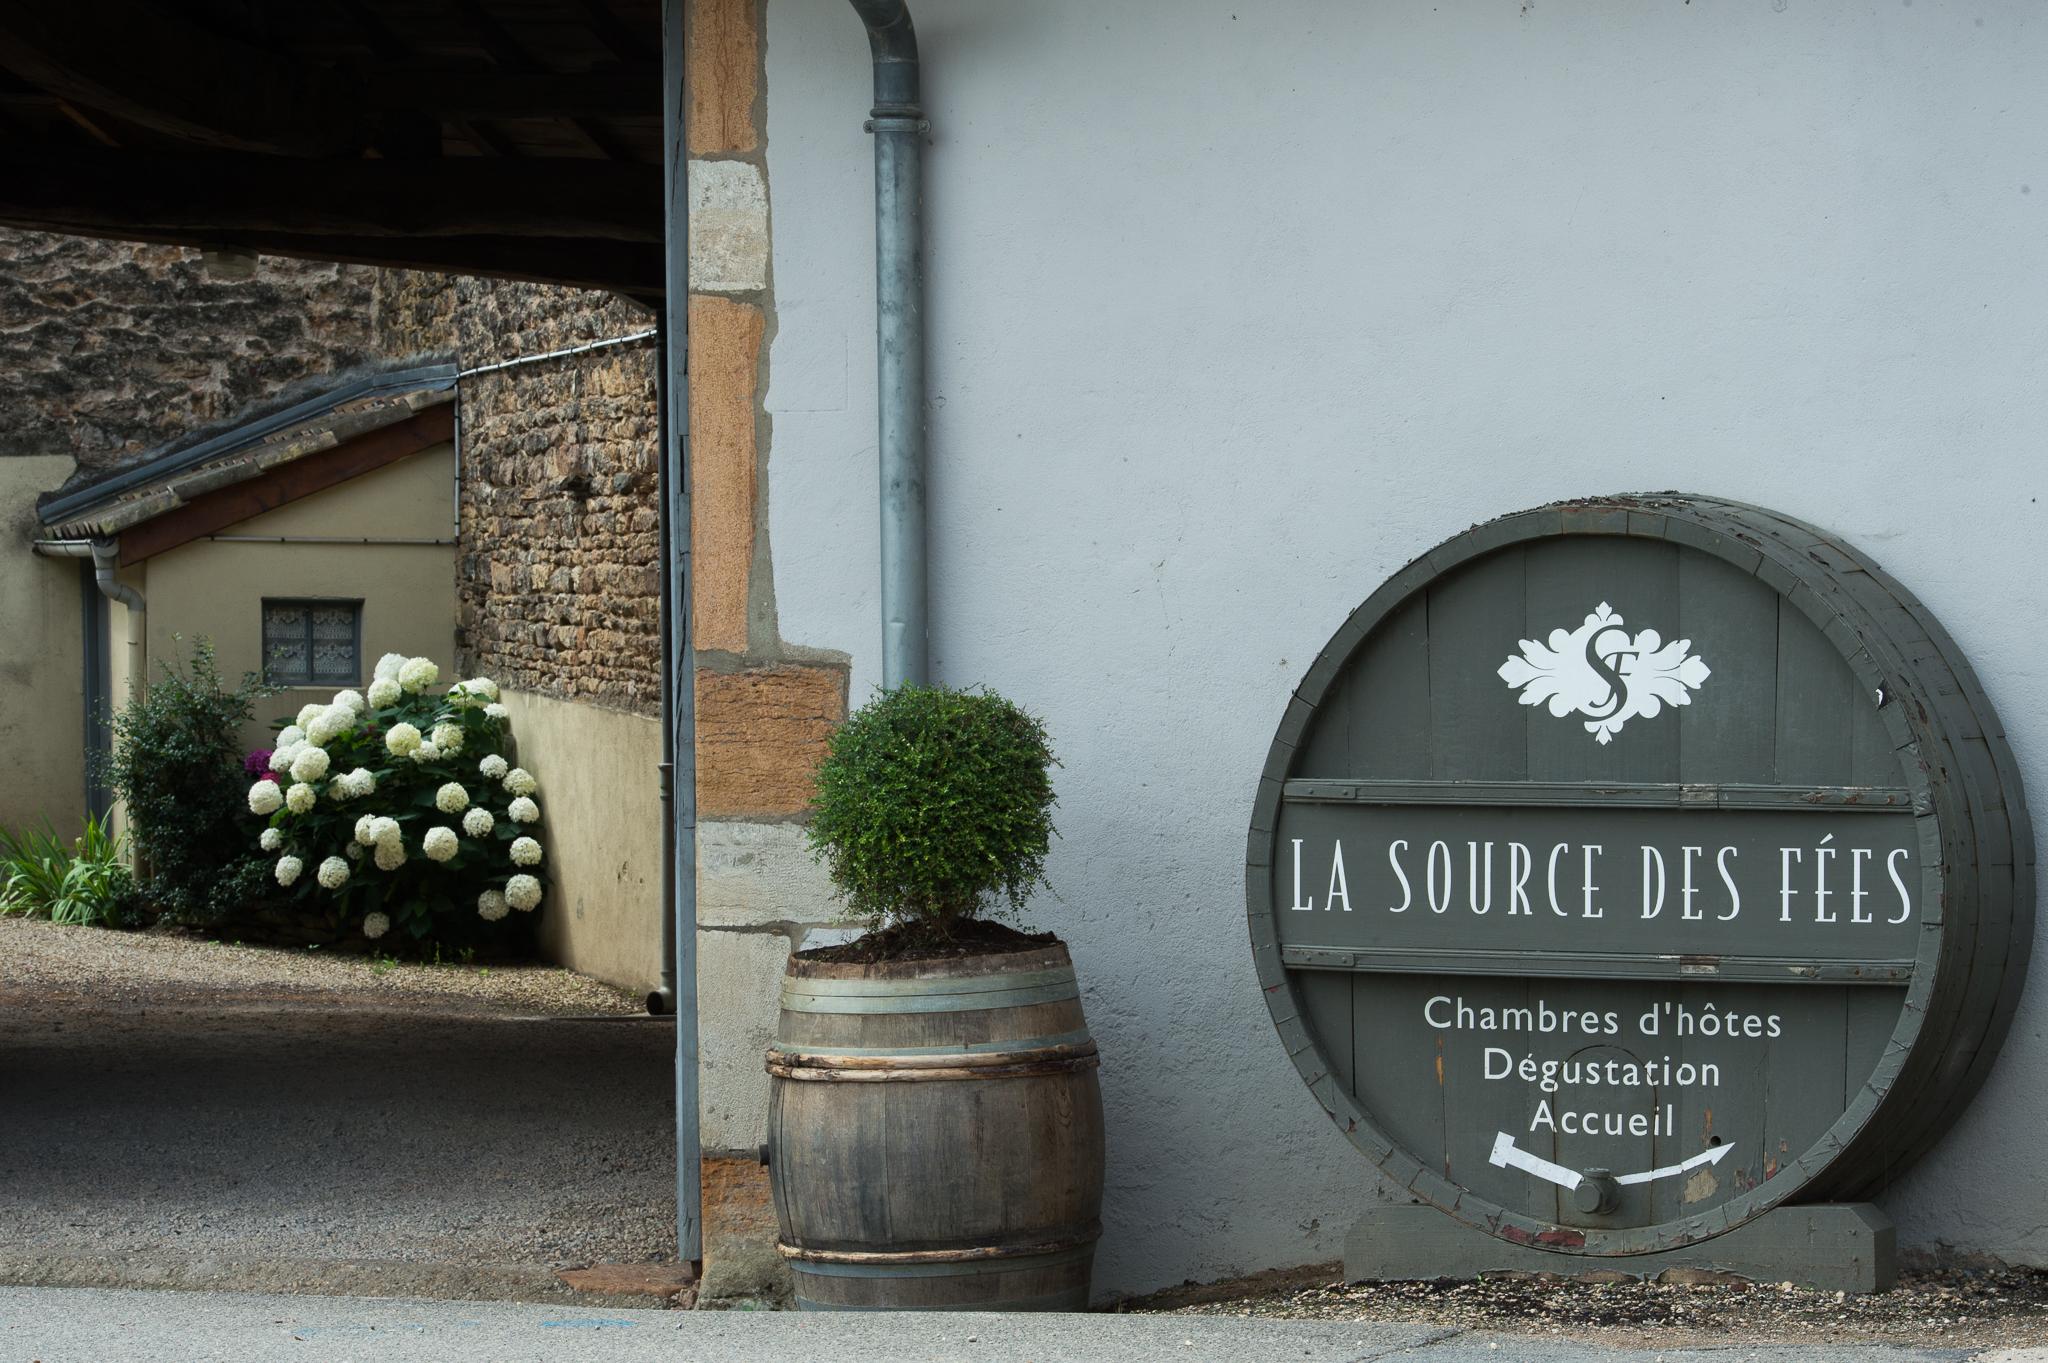 Jason-Davis-Images-Burgundy-0090.jpg